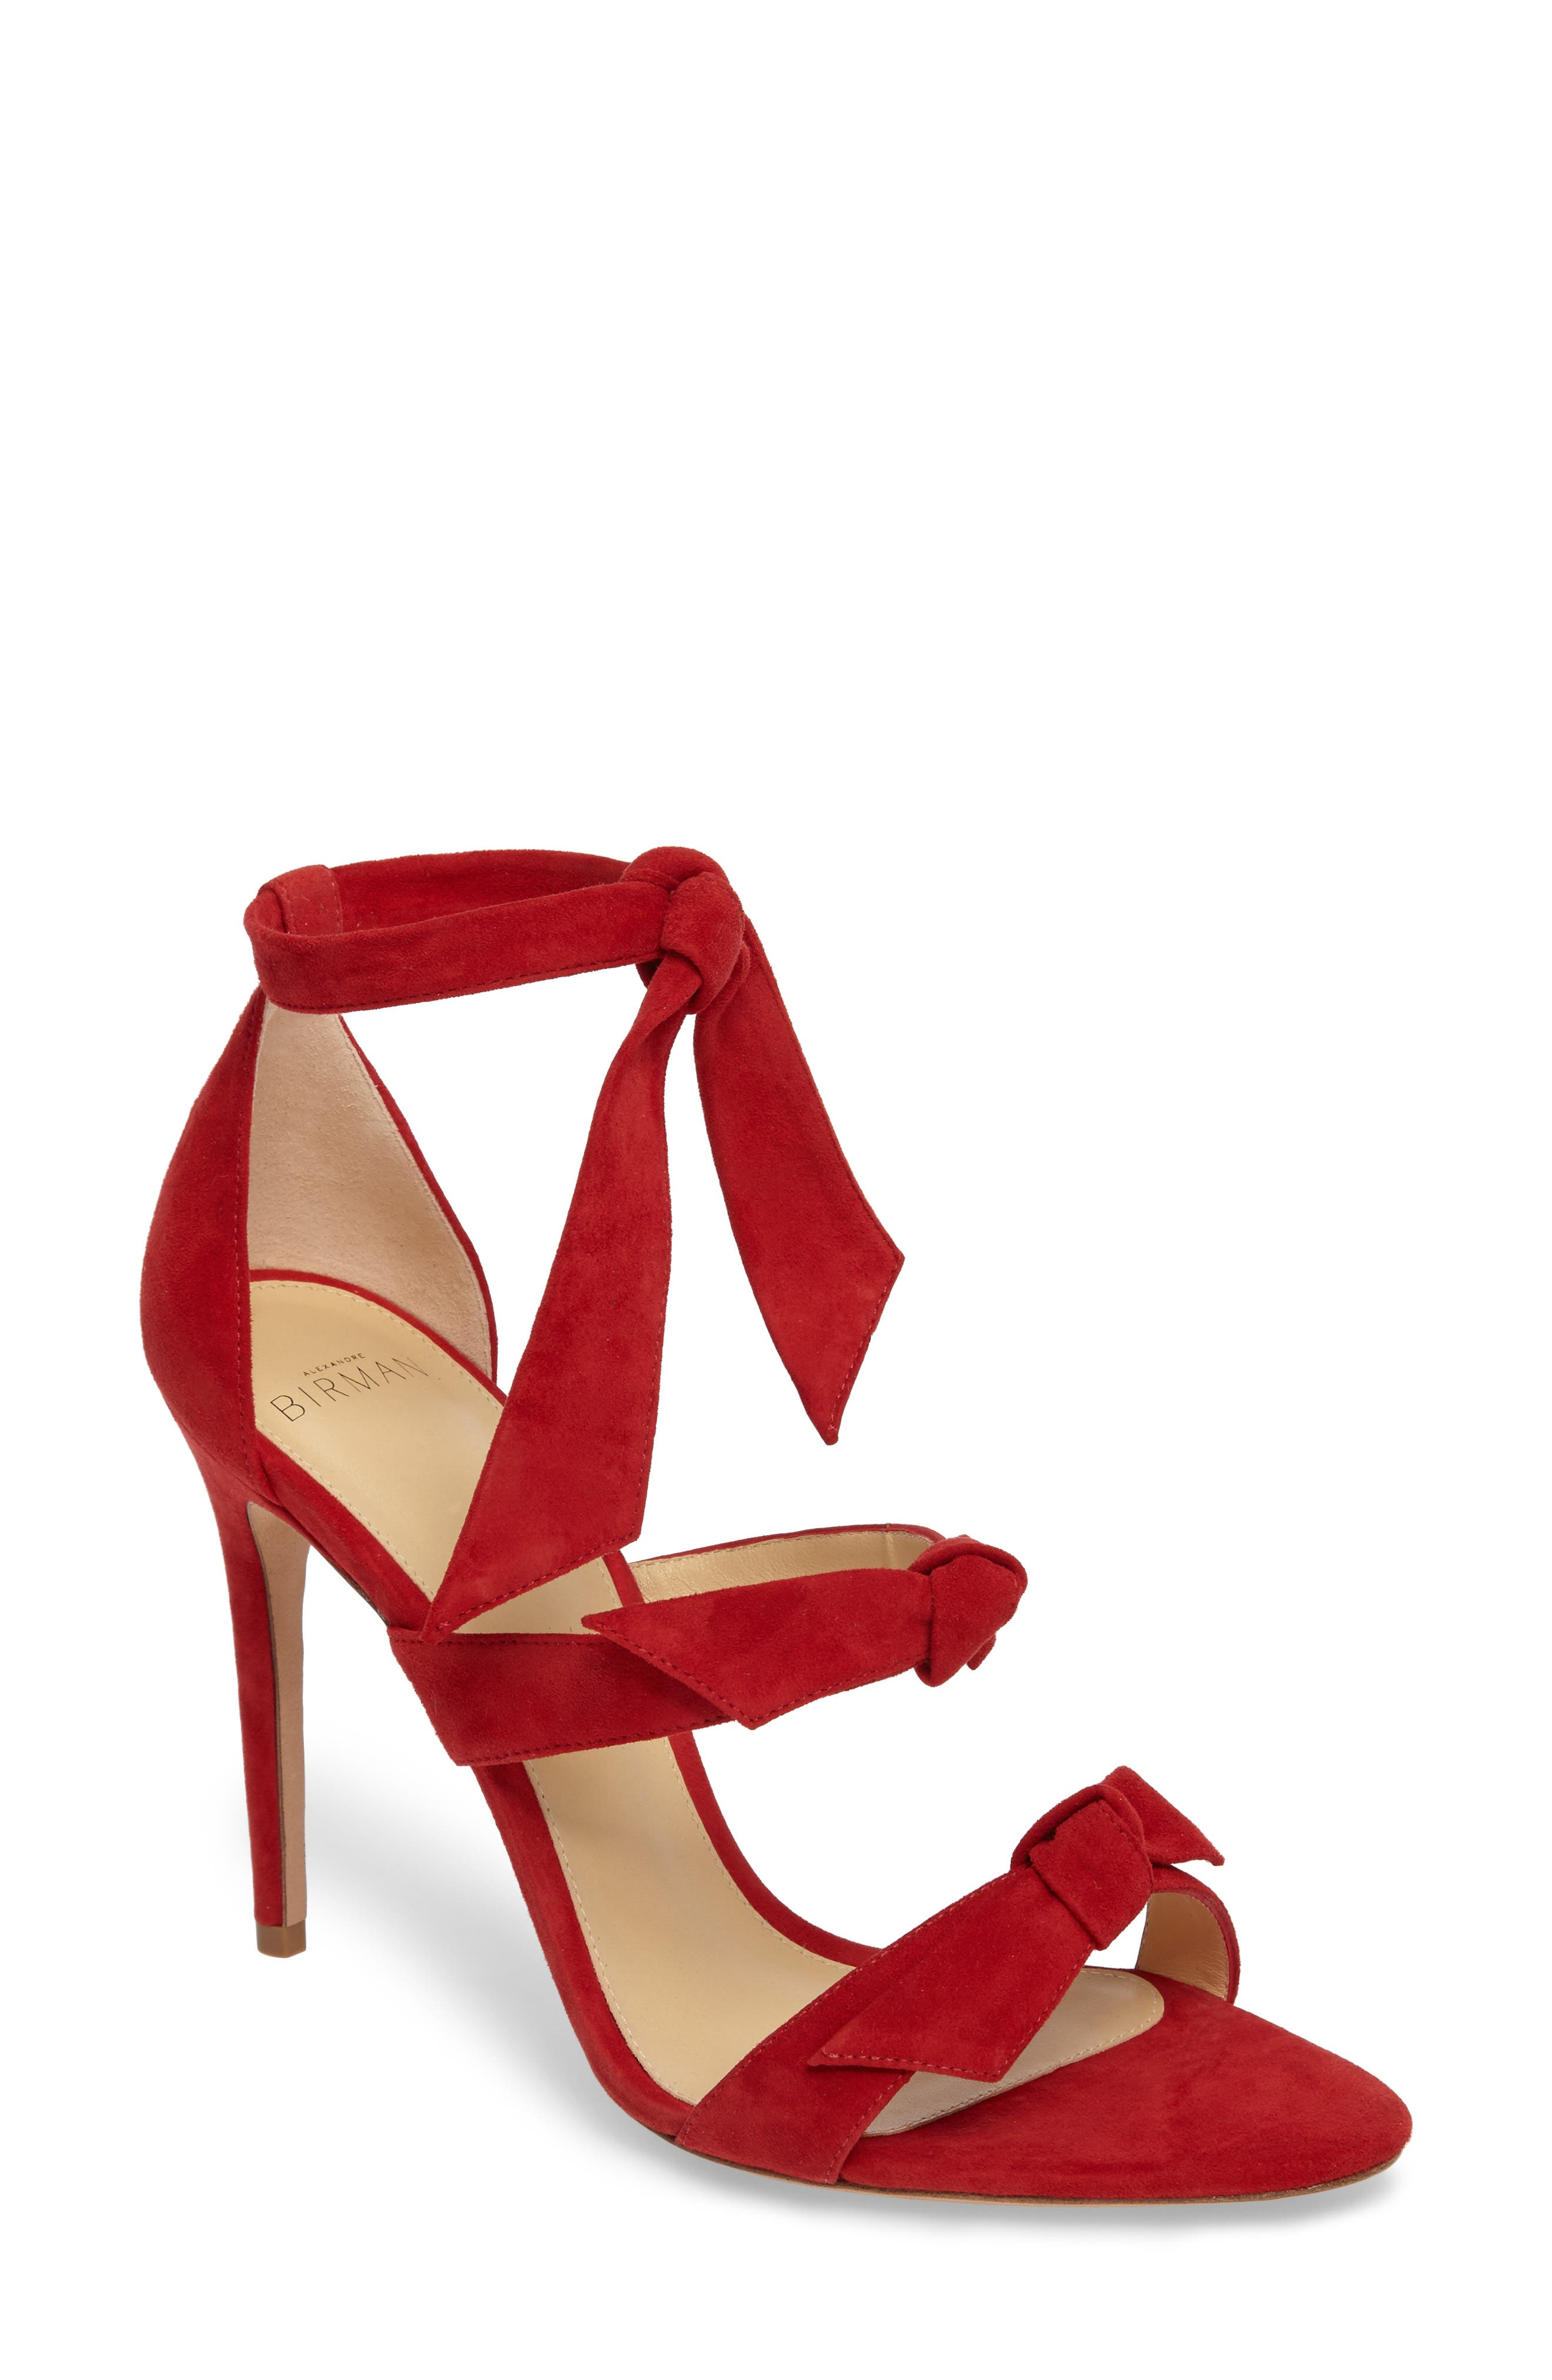 ALEXANDRE BIRMAN Lolita Sandal